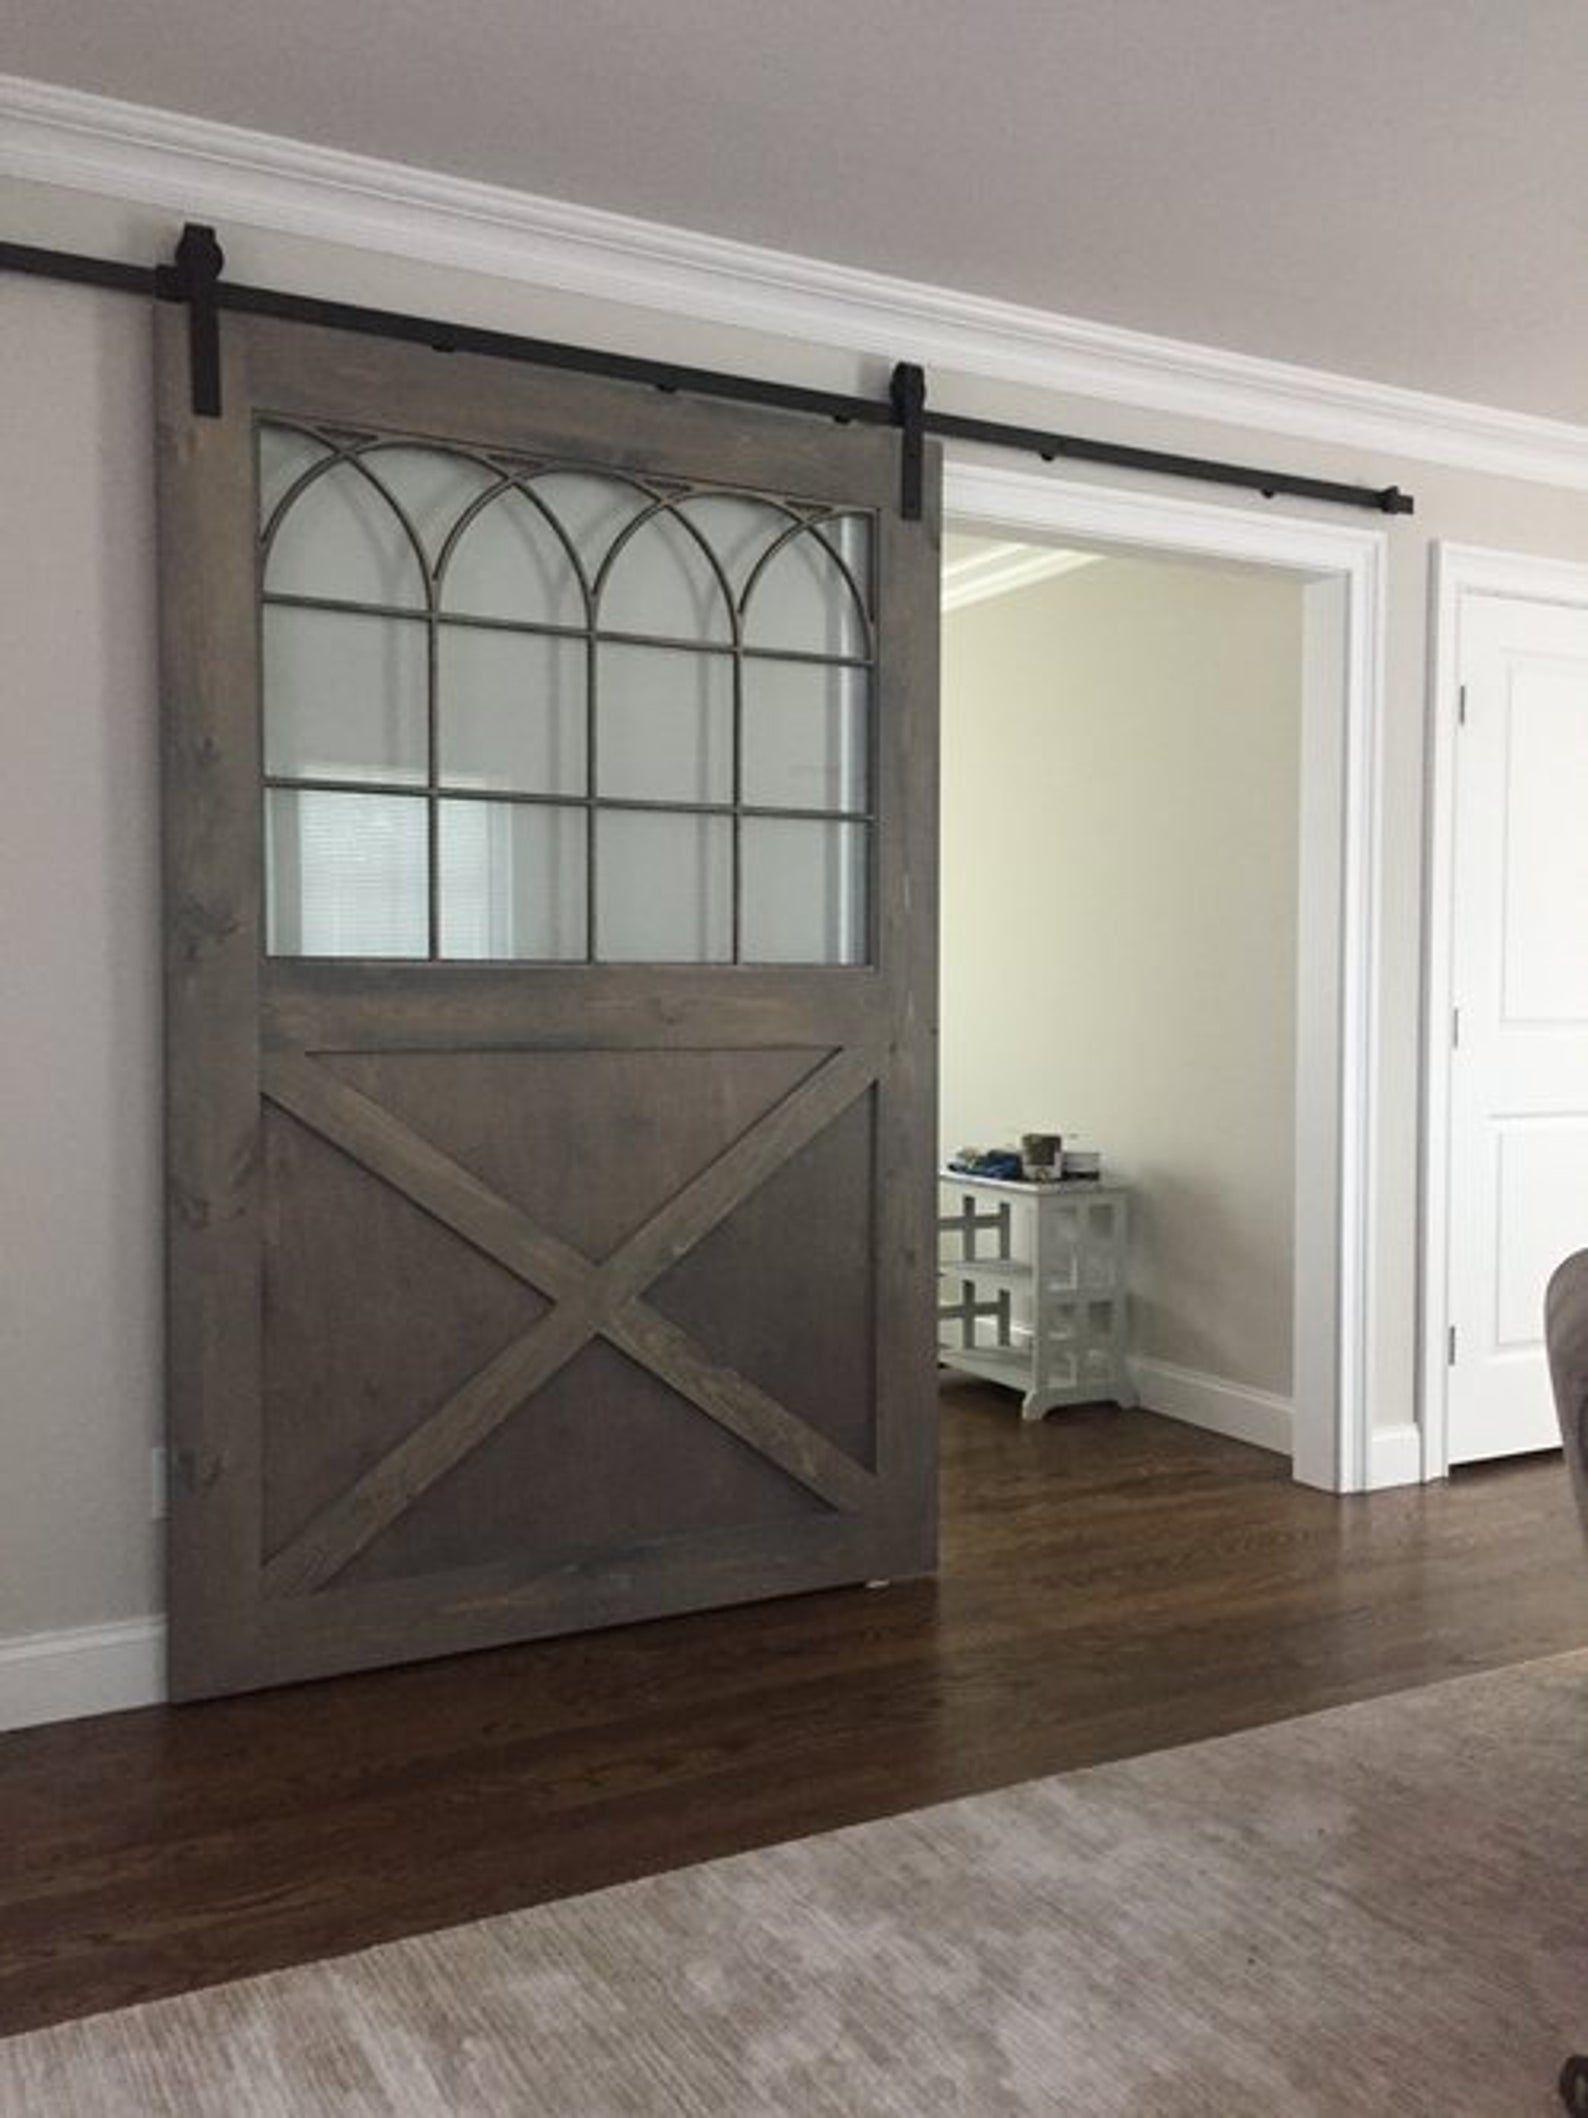 Custom Sliding Barn Door With Glass Insert And Gothic Grill Etsy In 2020 Glass Door Glass Barn Doors Barn Doors Sliding